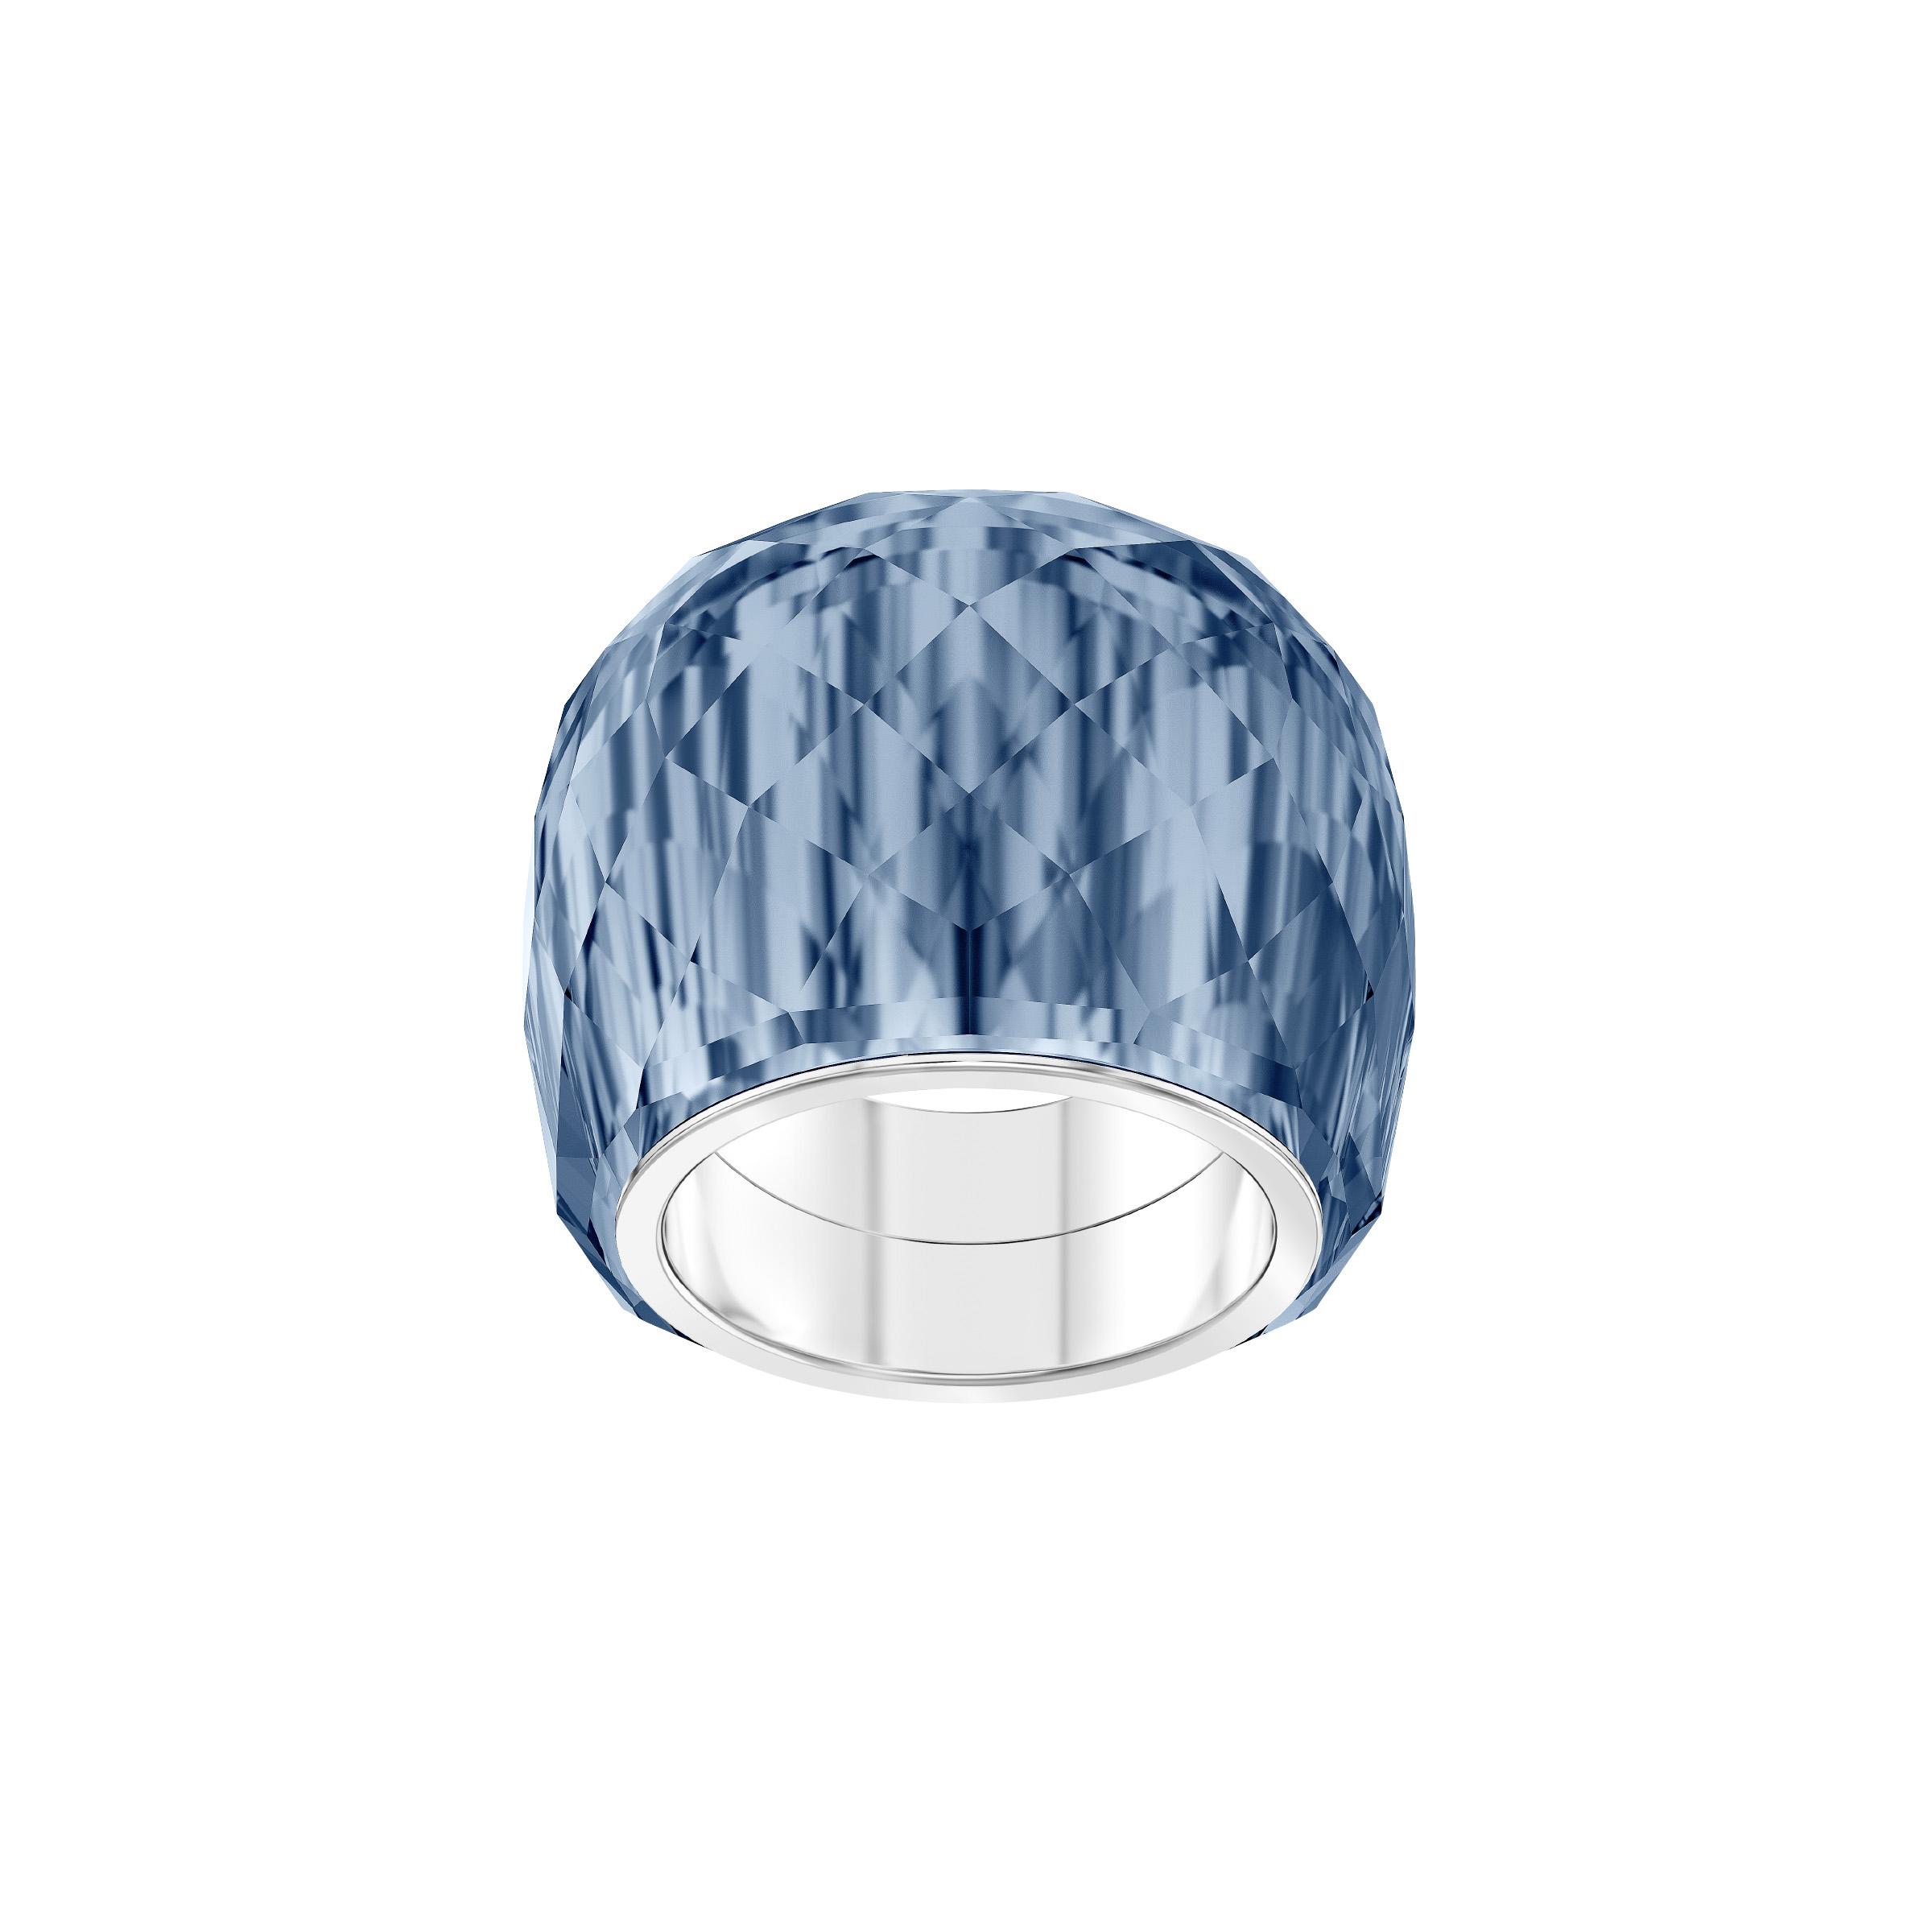 Bague Swarovski Nirvana, bleu, acier inoxydable, Swarovski